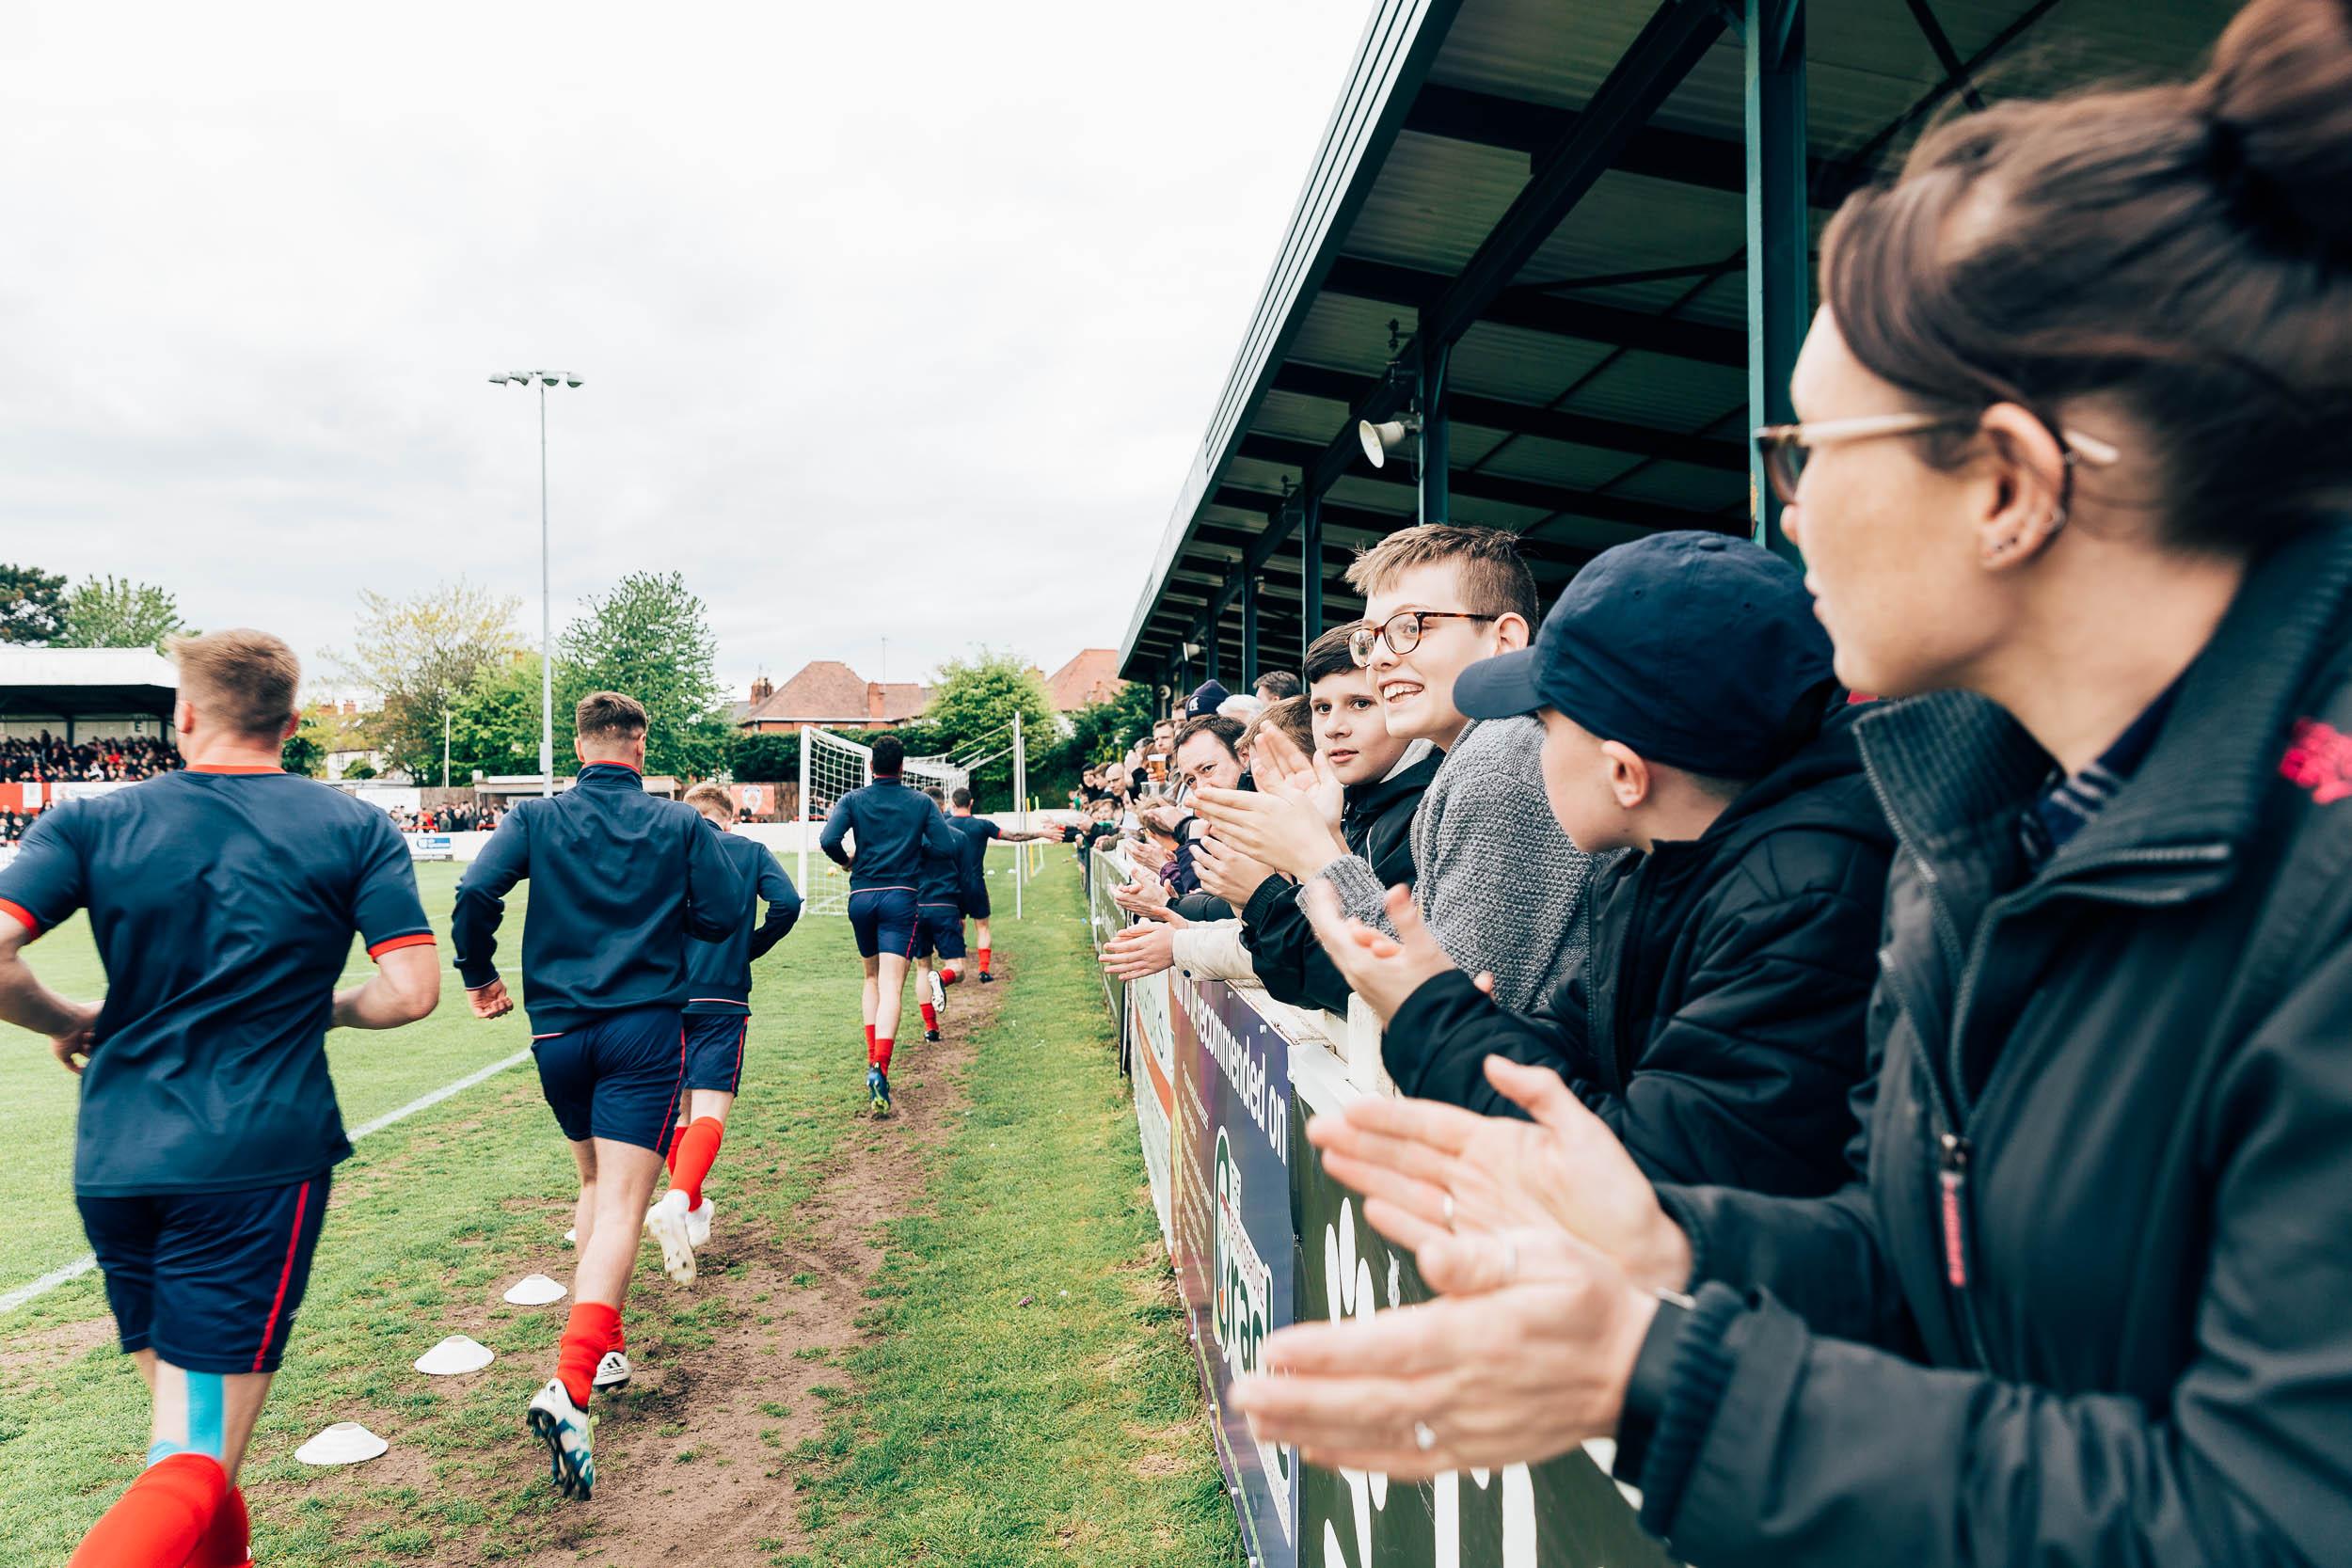 06_05_2019_Bromsgrove_Sporting_Corby-31.jpg